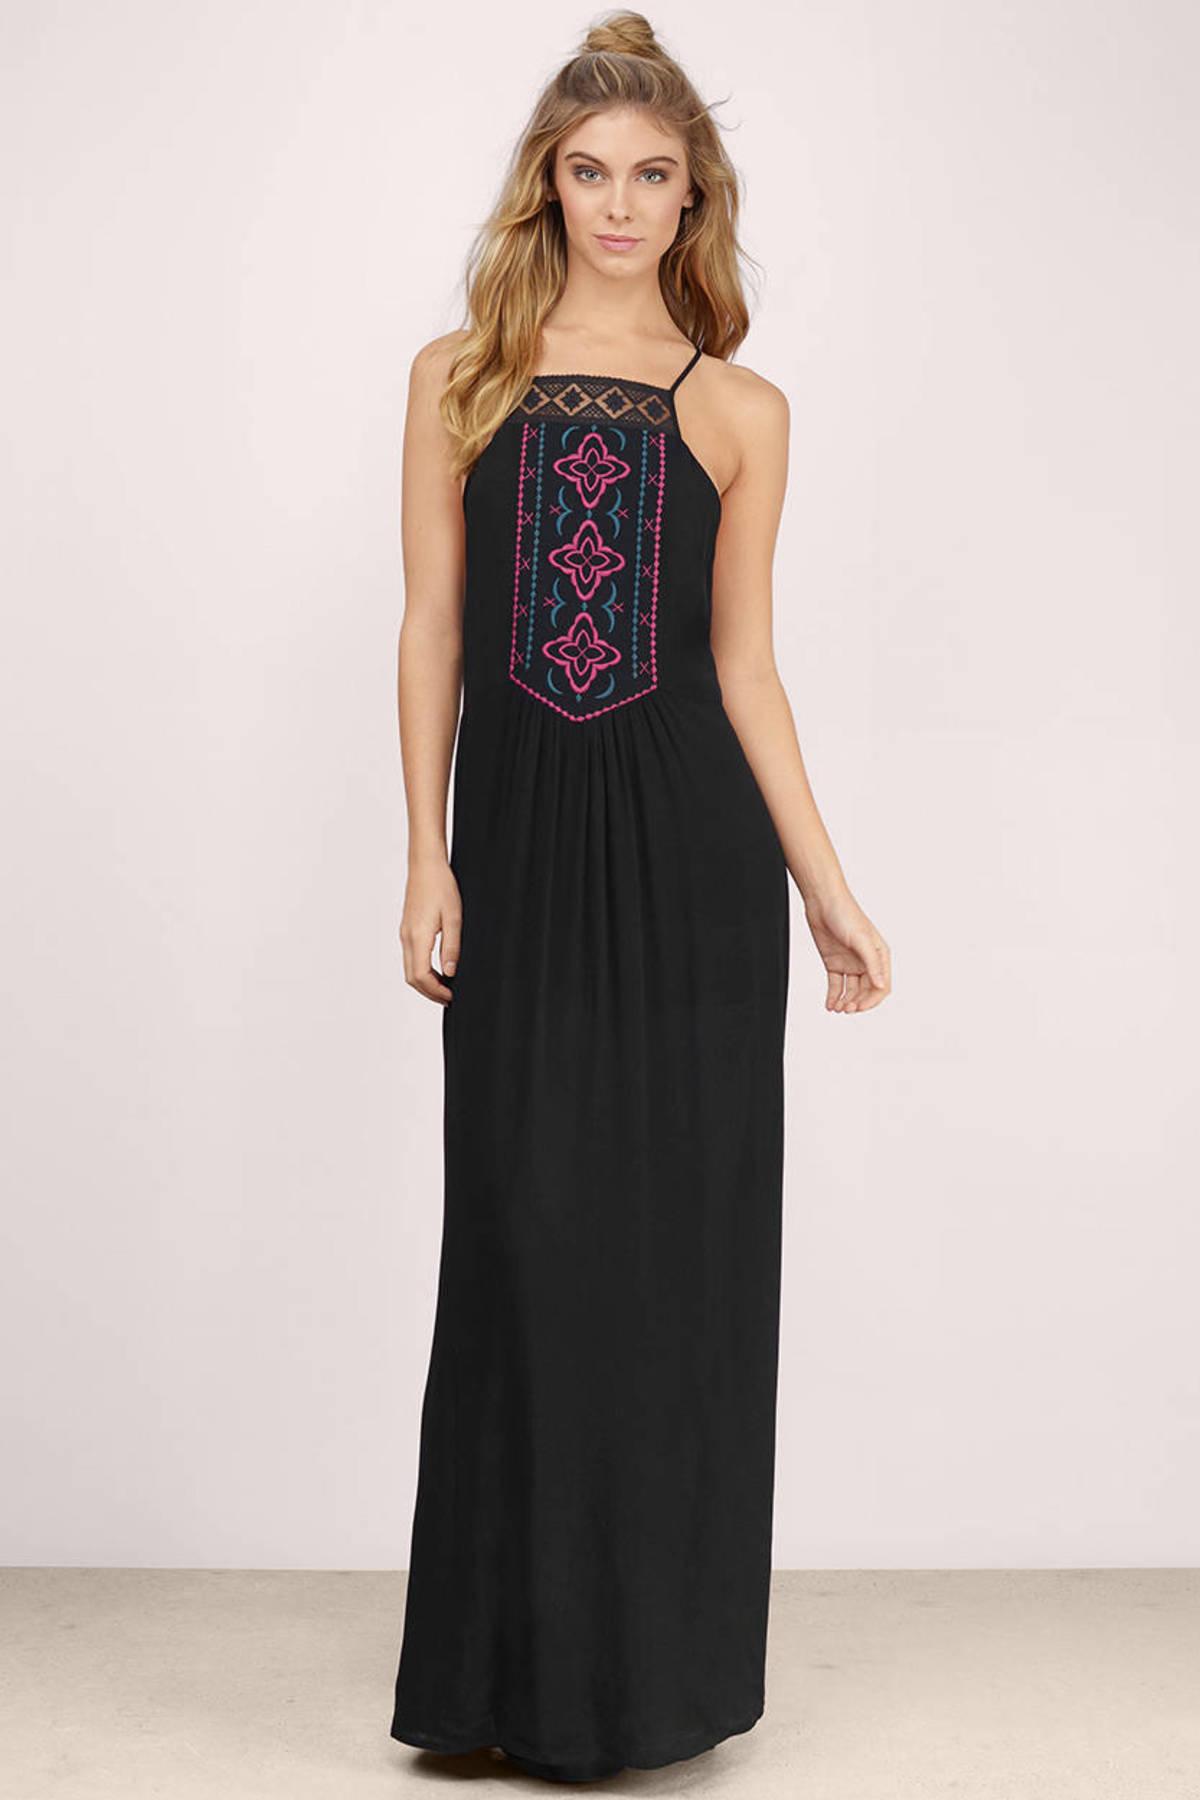 Cute Black Maxi Dress - Black Dress - Open Back Dress - $13.00